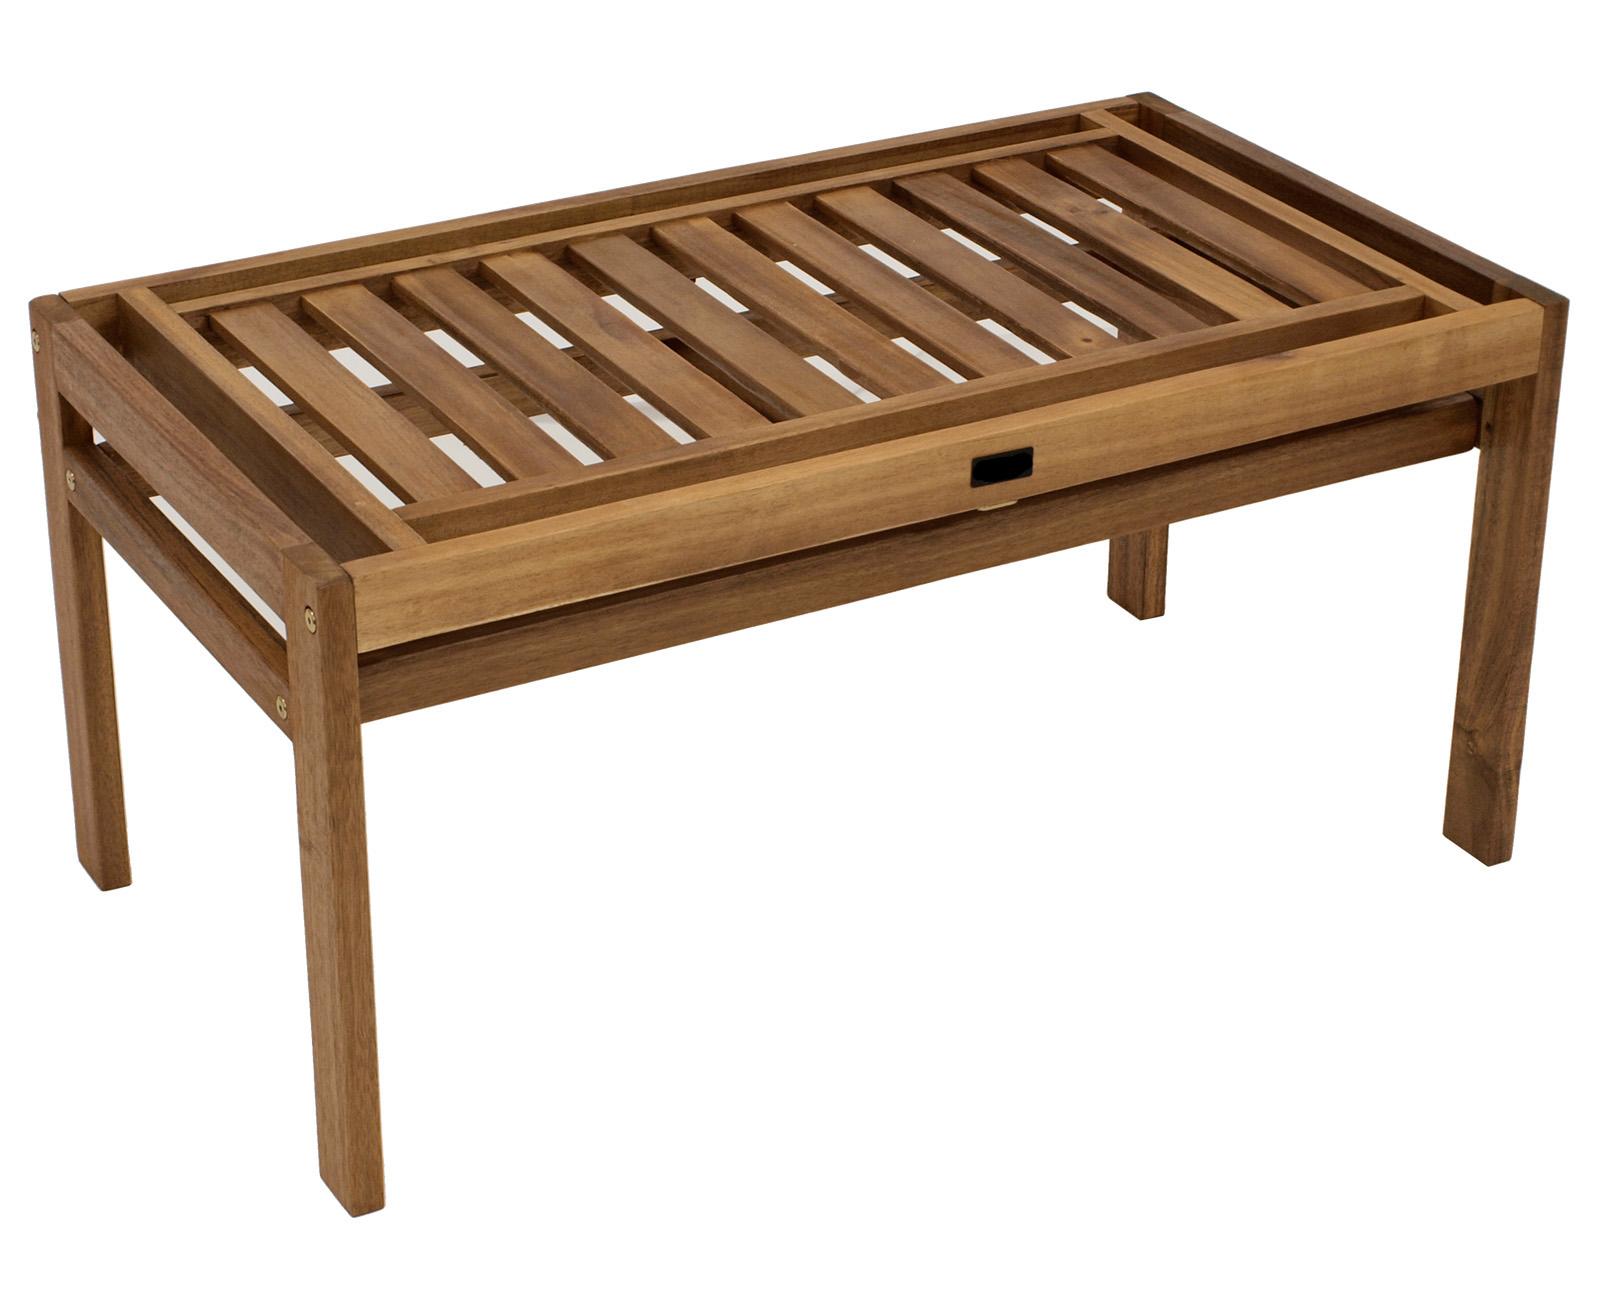 hockerbank modular 2 sitzer gartenbank akazienholz fsc garten bank siena garden ebay. Black Bedroom Furniture Sets. Home Design Ideas